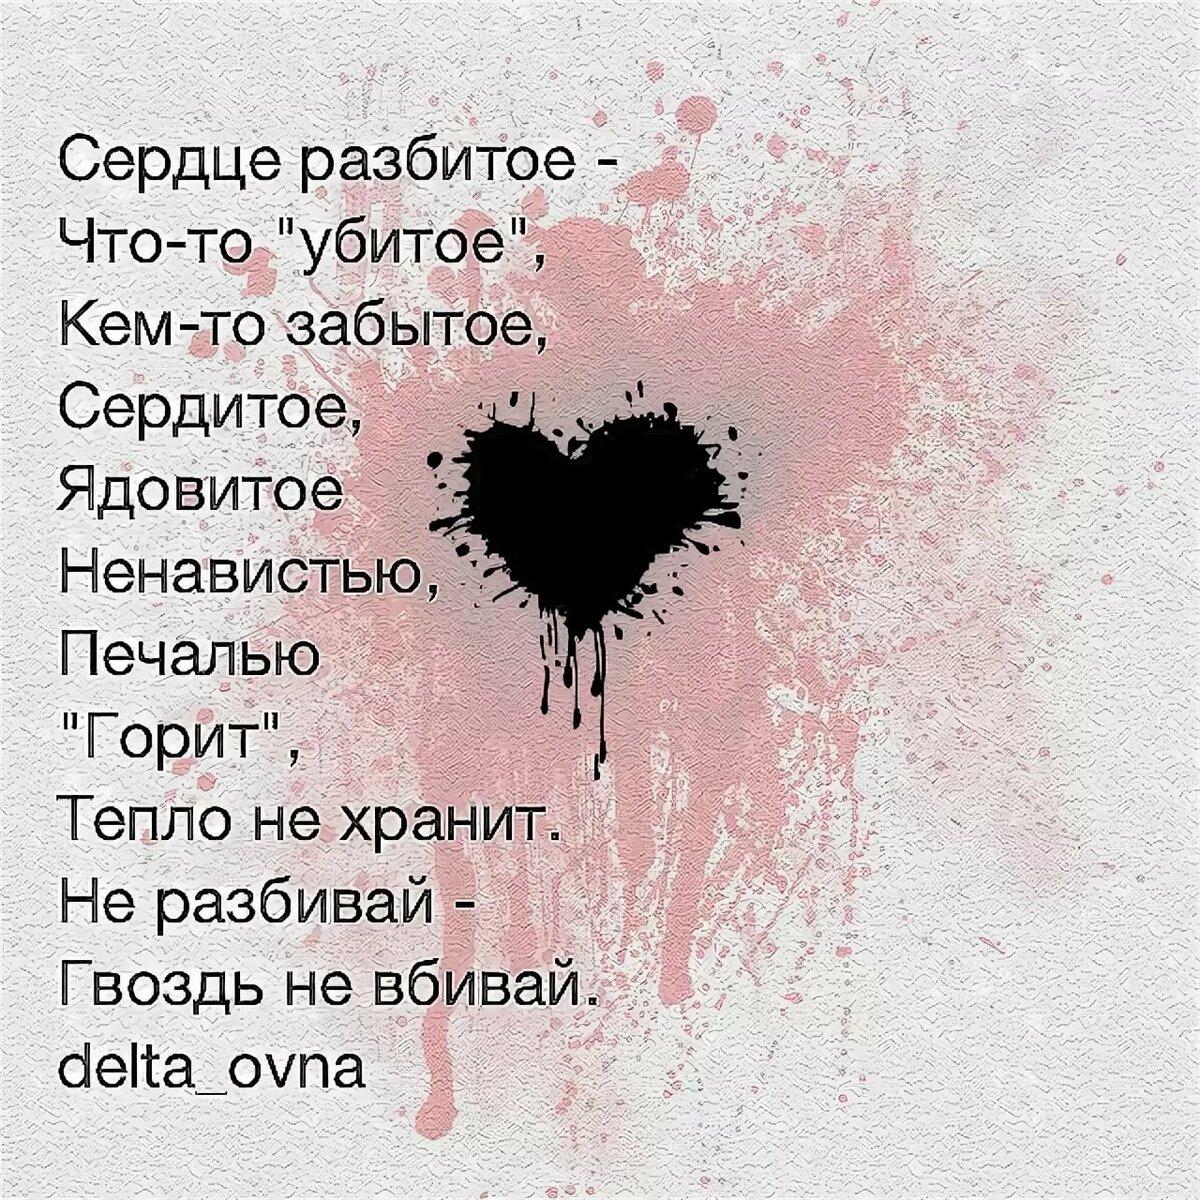 думаете, грустные картинки про разбитое сердце разврата разрыва